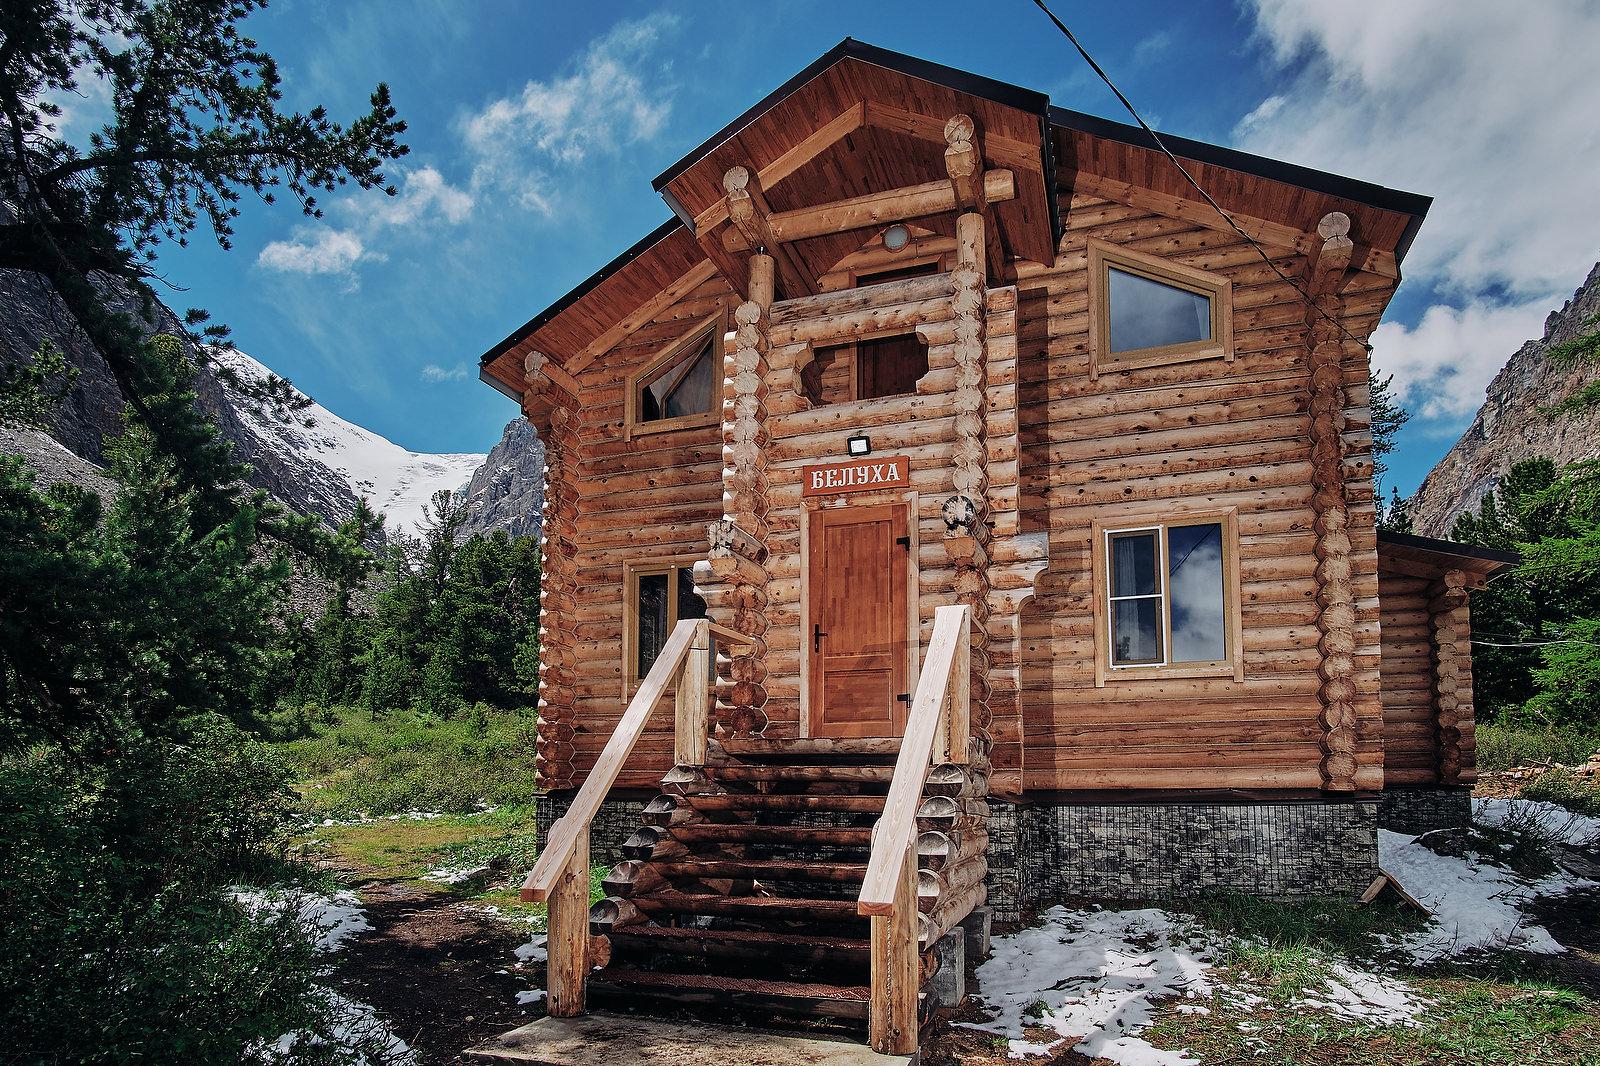 горный центр алтай актру дом белуха снаружи